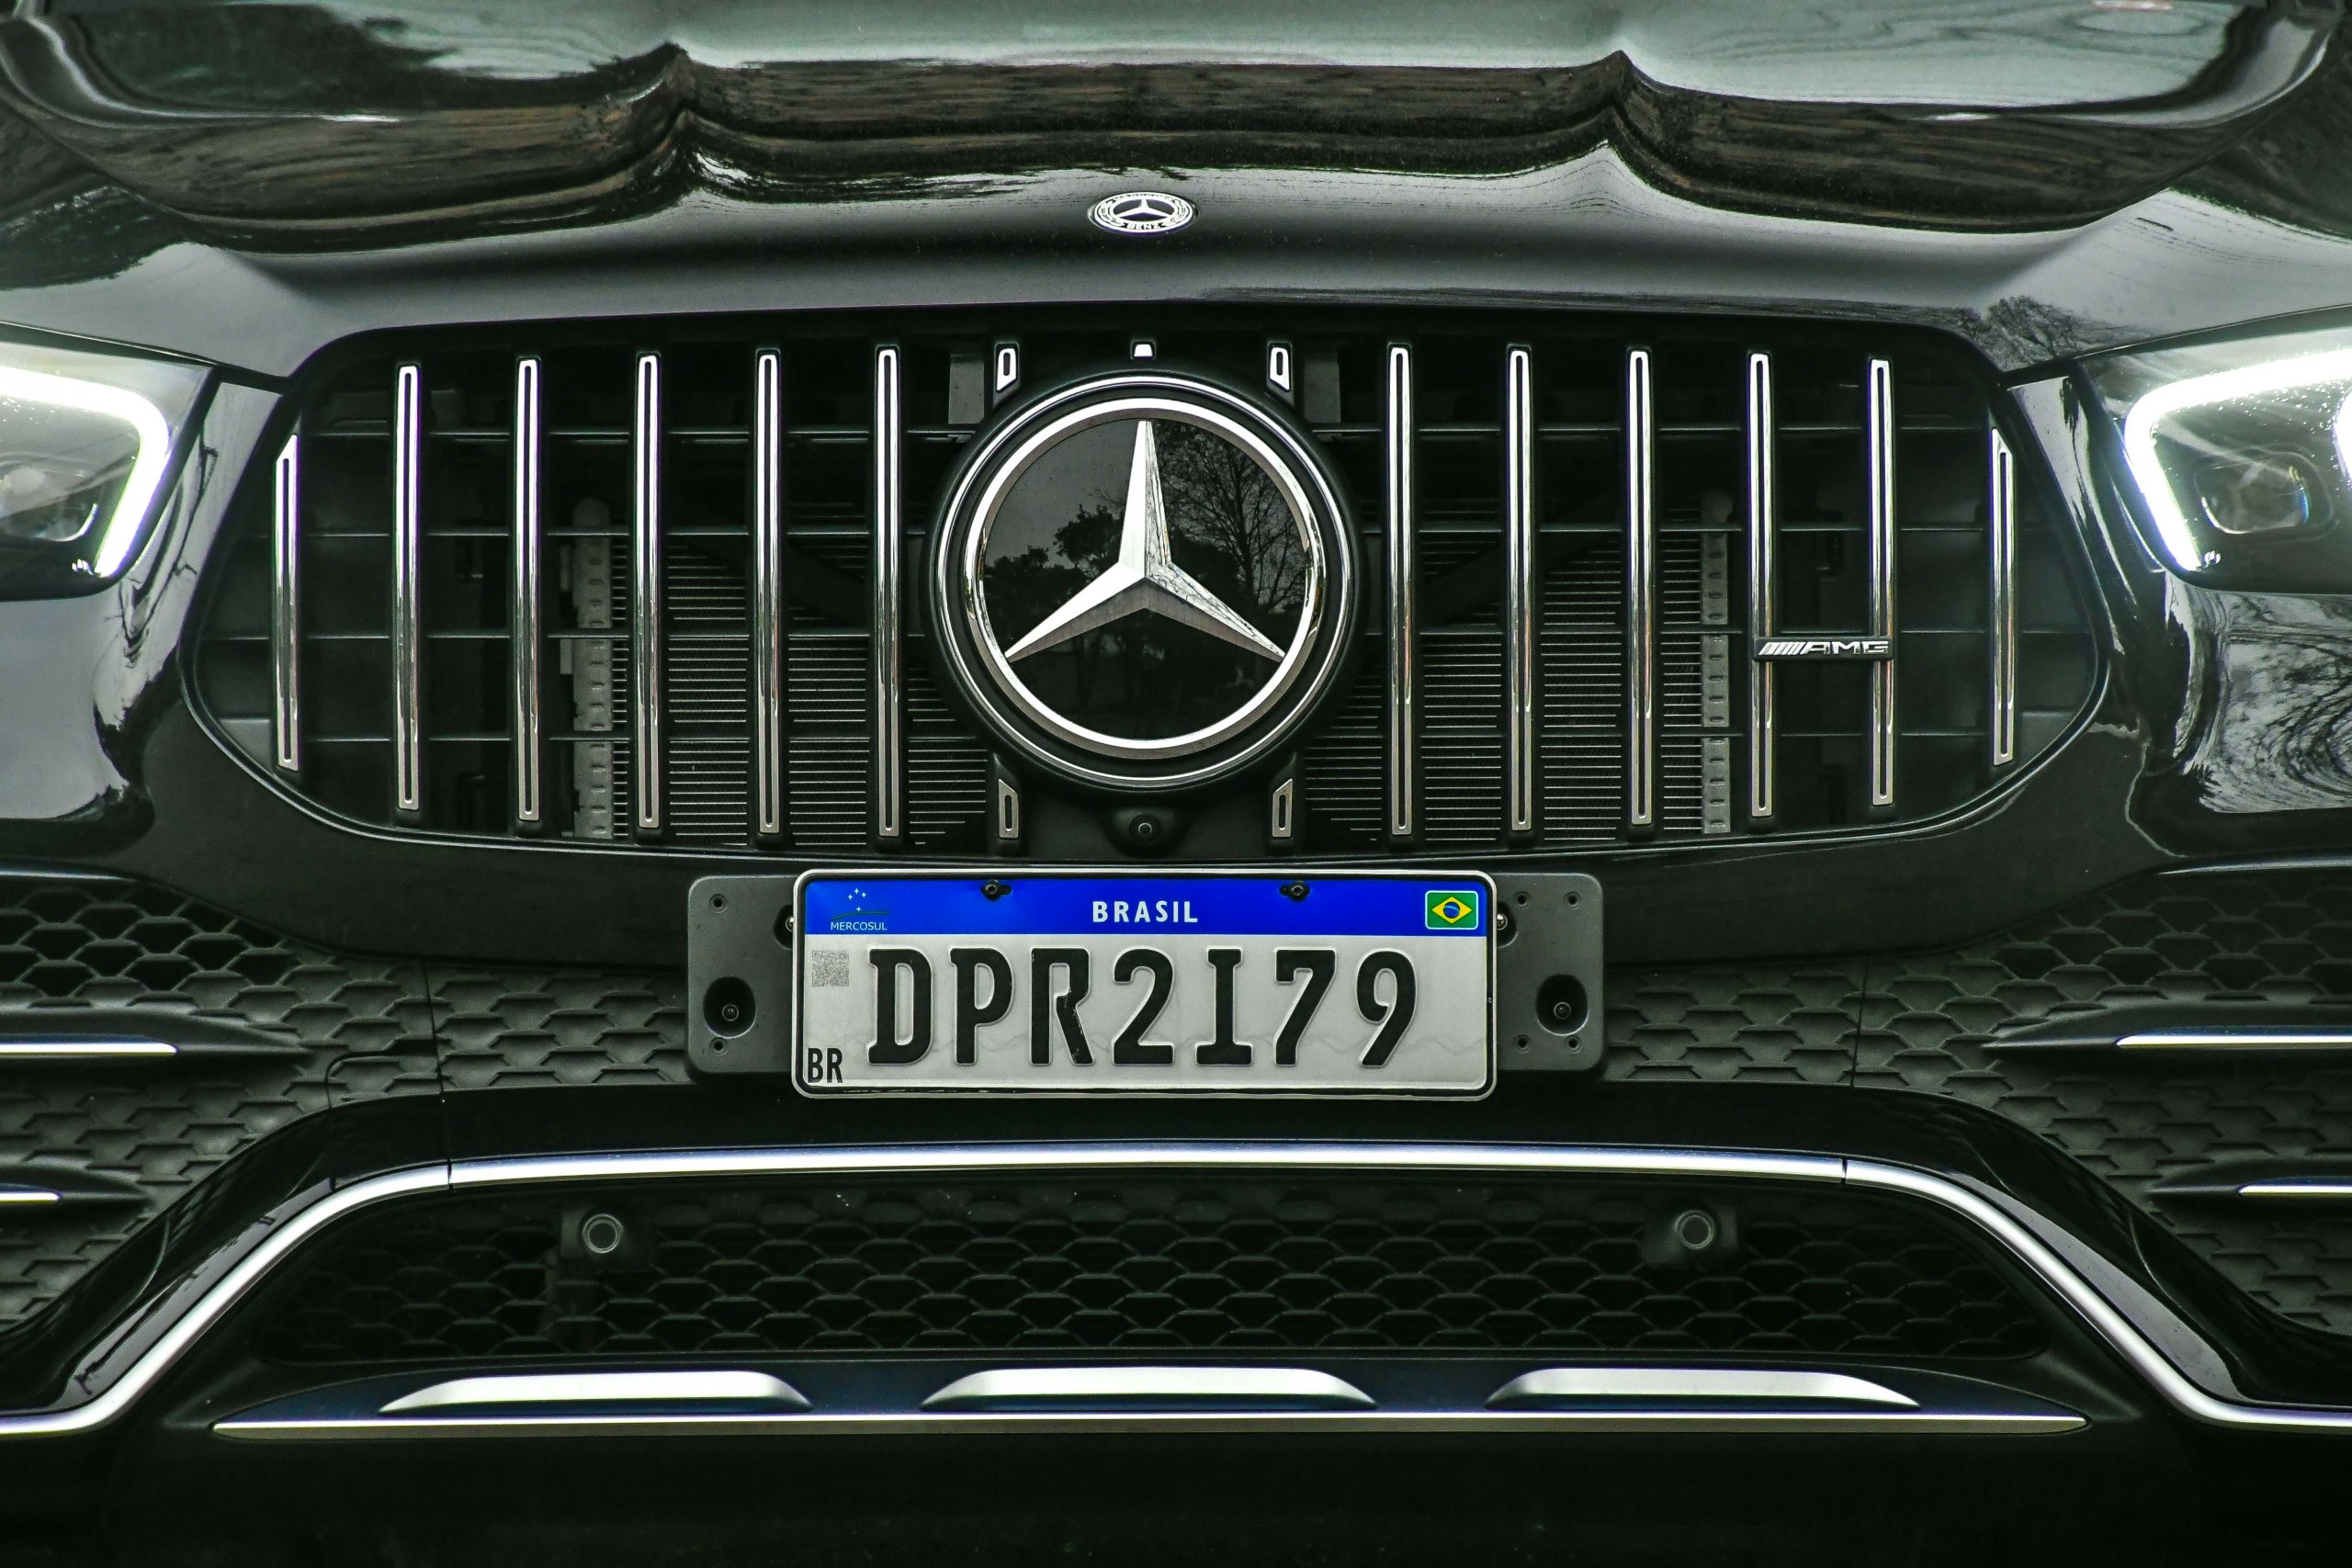 Mercedes Benz Gle 53 Amg 4300